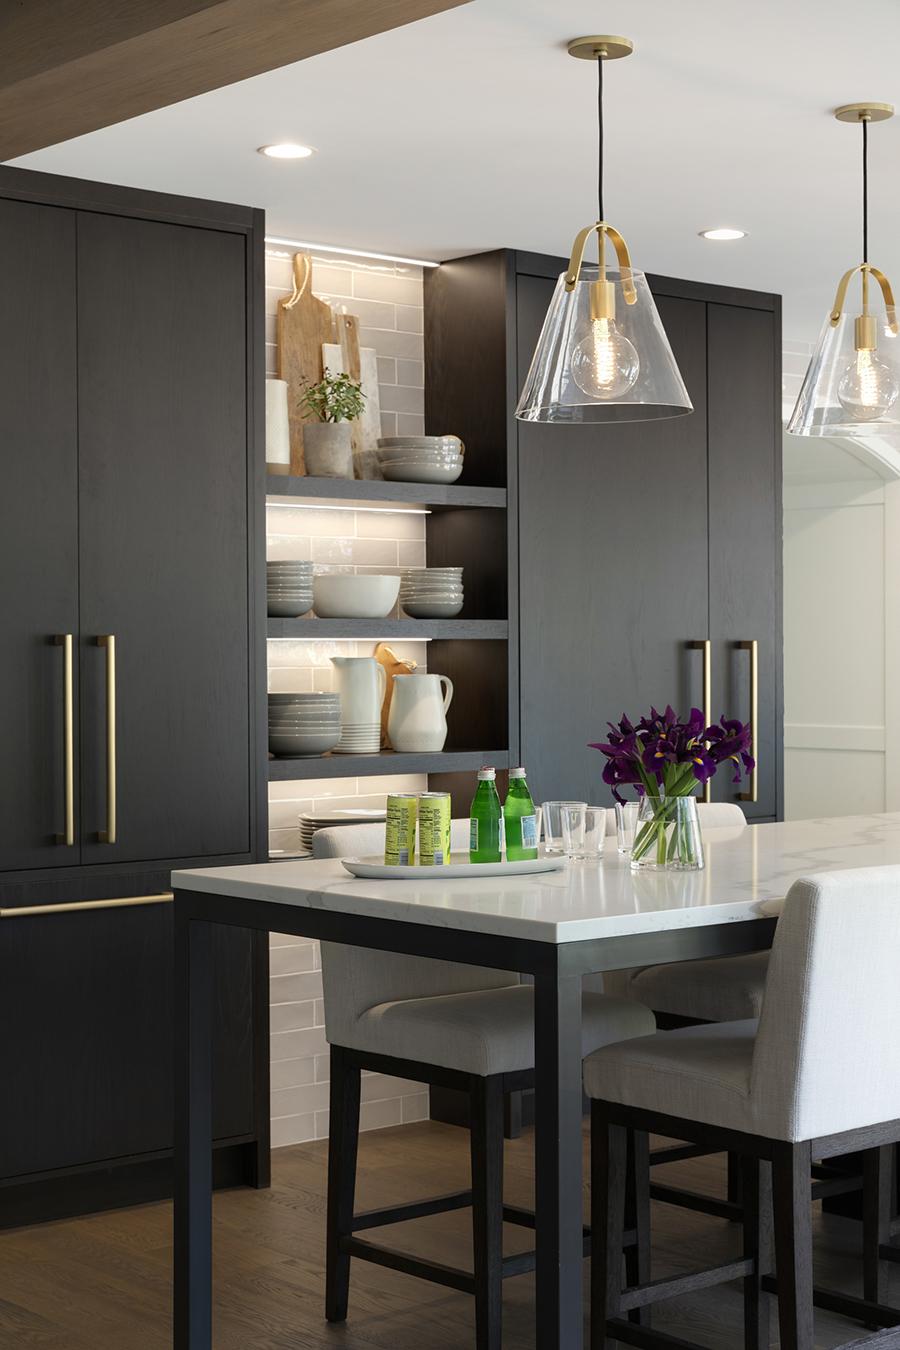 Belle Kitchen Interior Design Designer Luxury Minnesota MN Mpls Minneapolis St Paul Twin Cities4.jpg